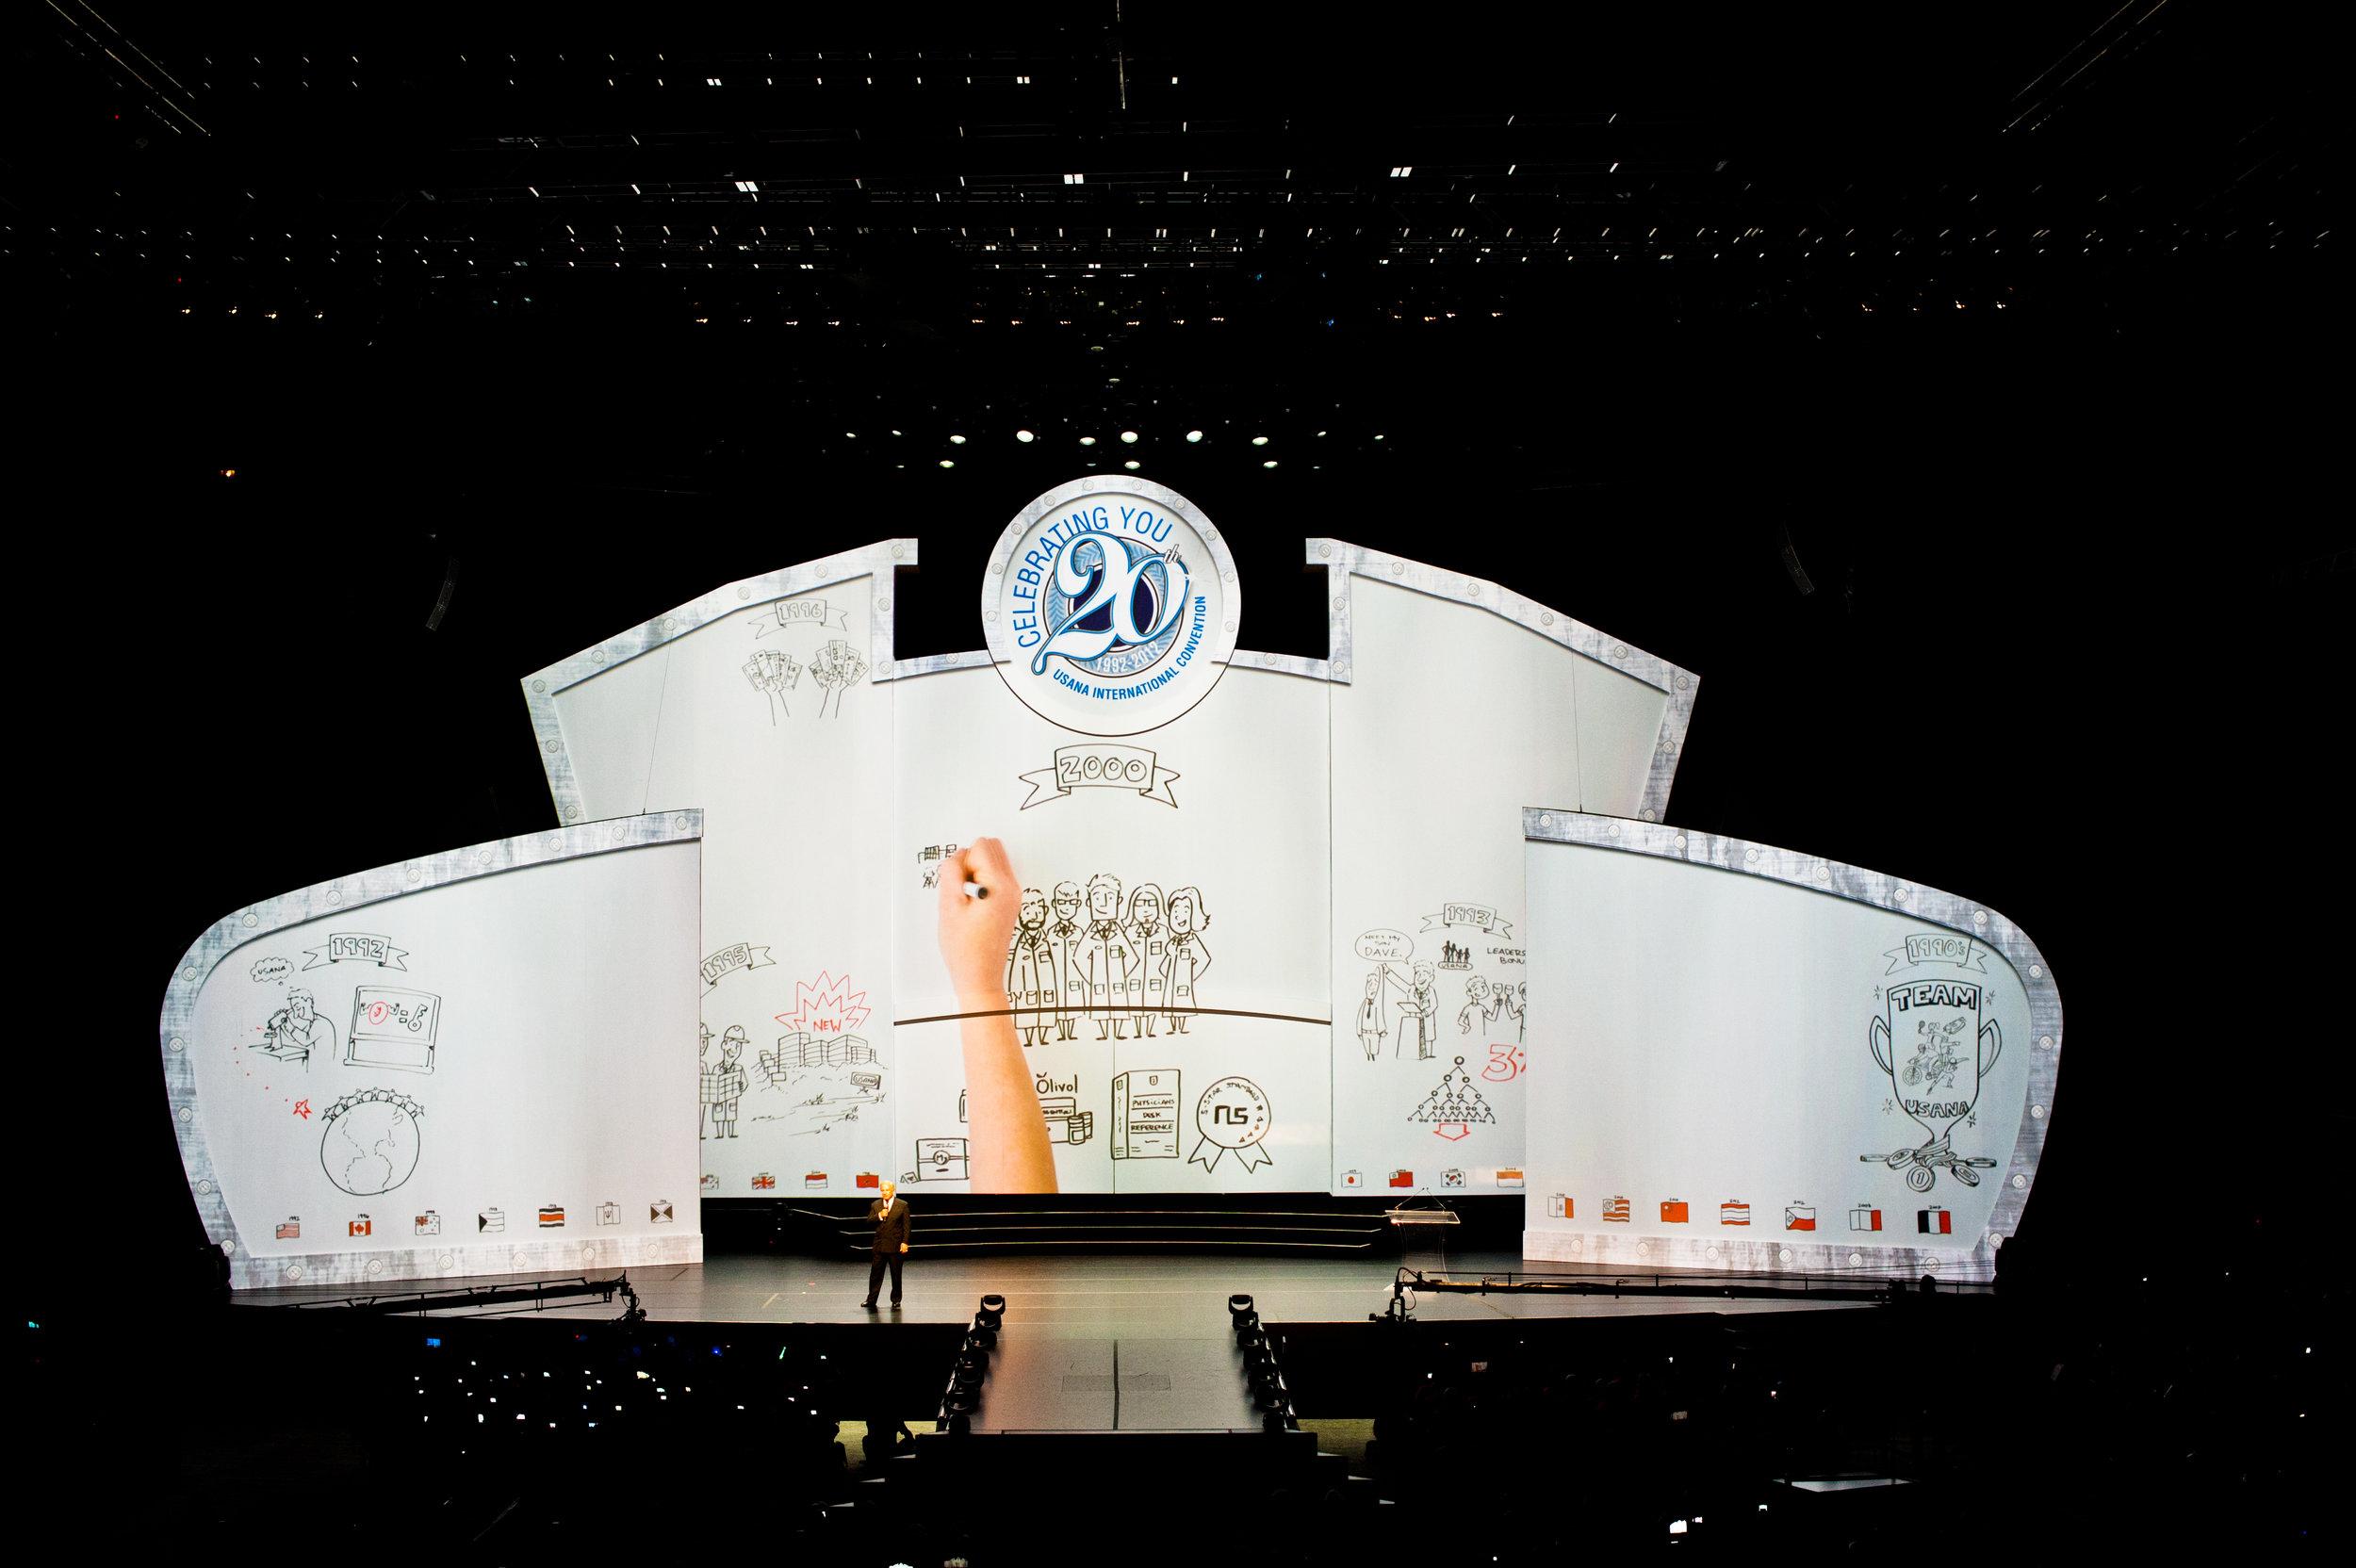 Usana International Convention 2012